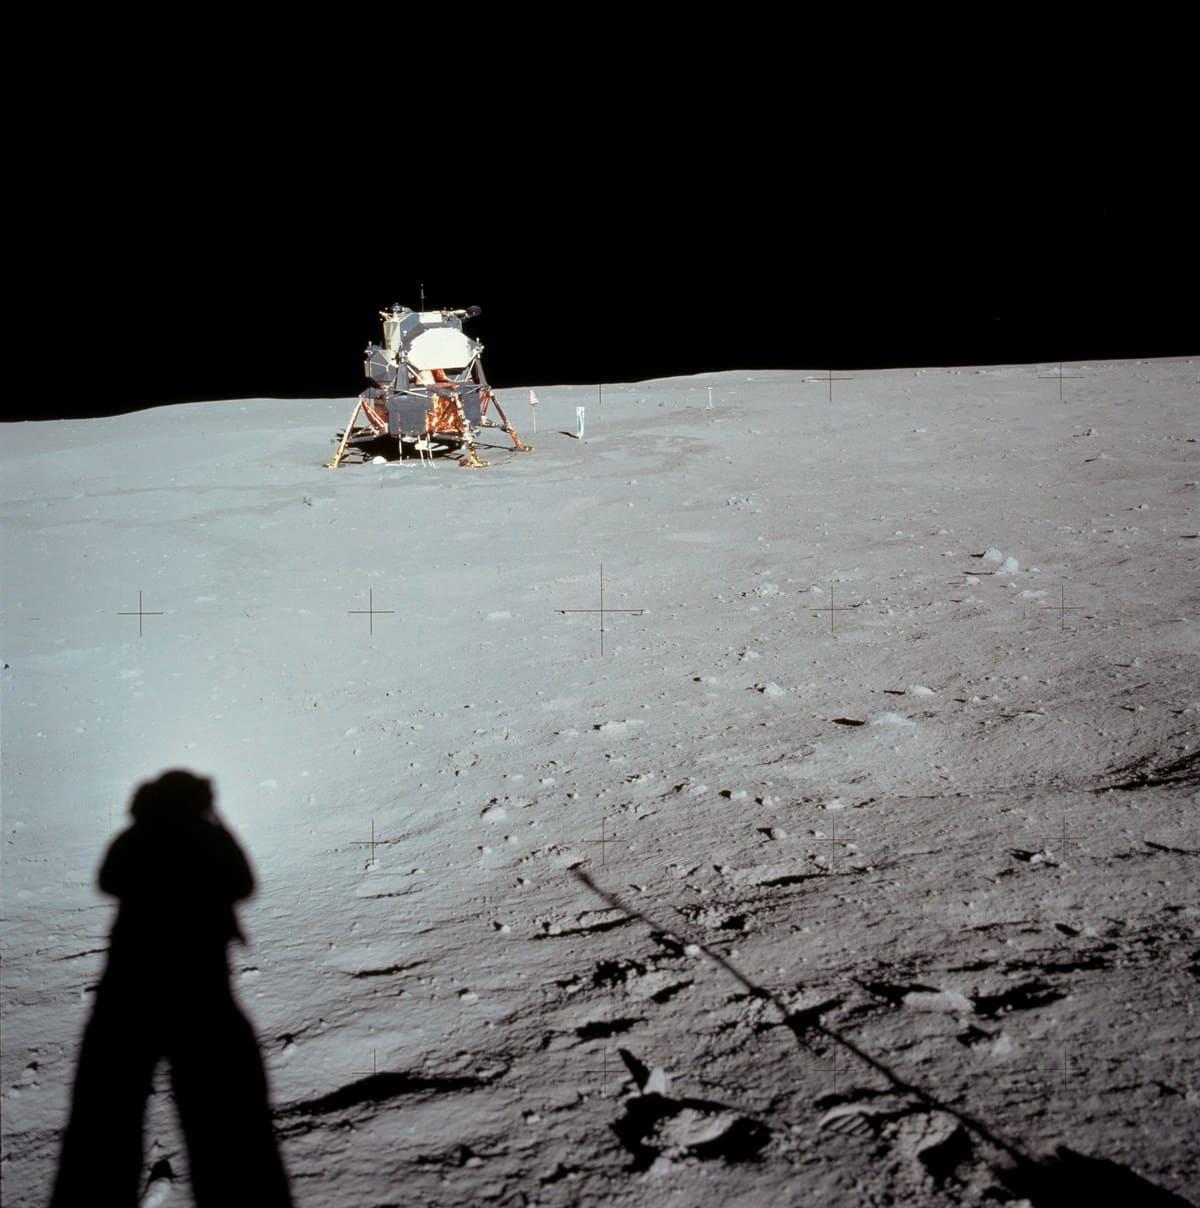 Hasselblad Moon Camera